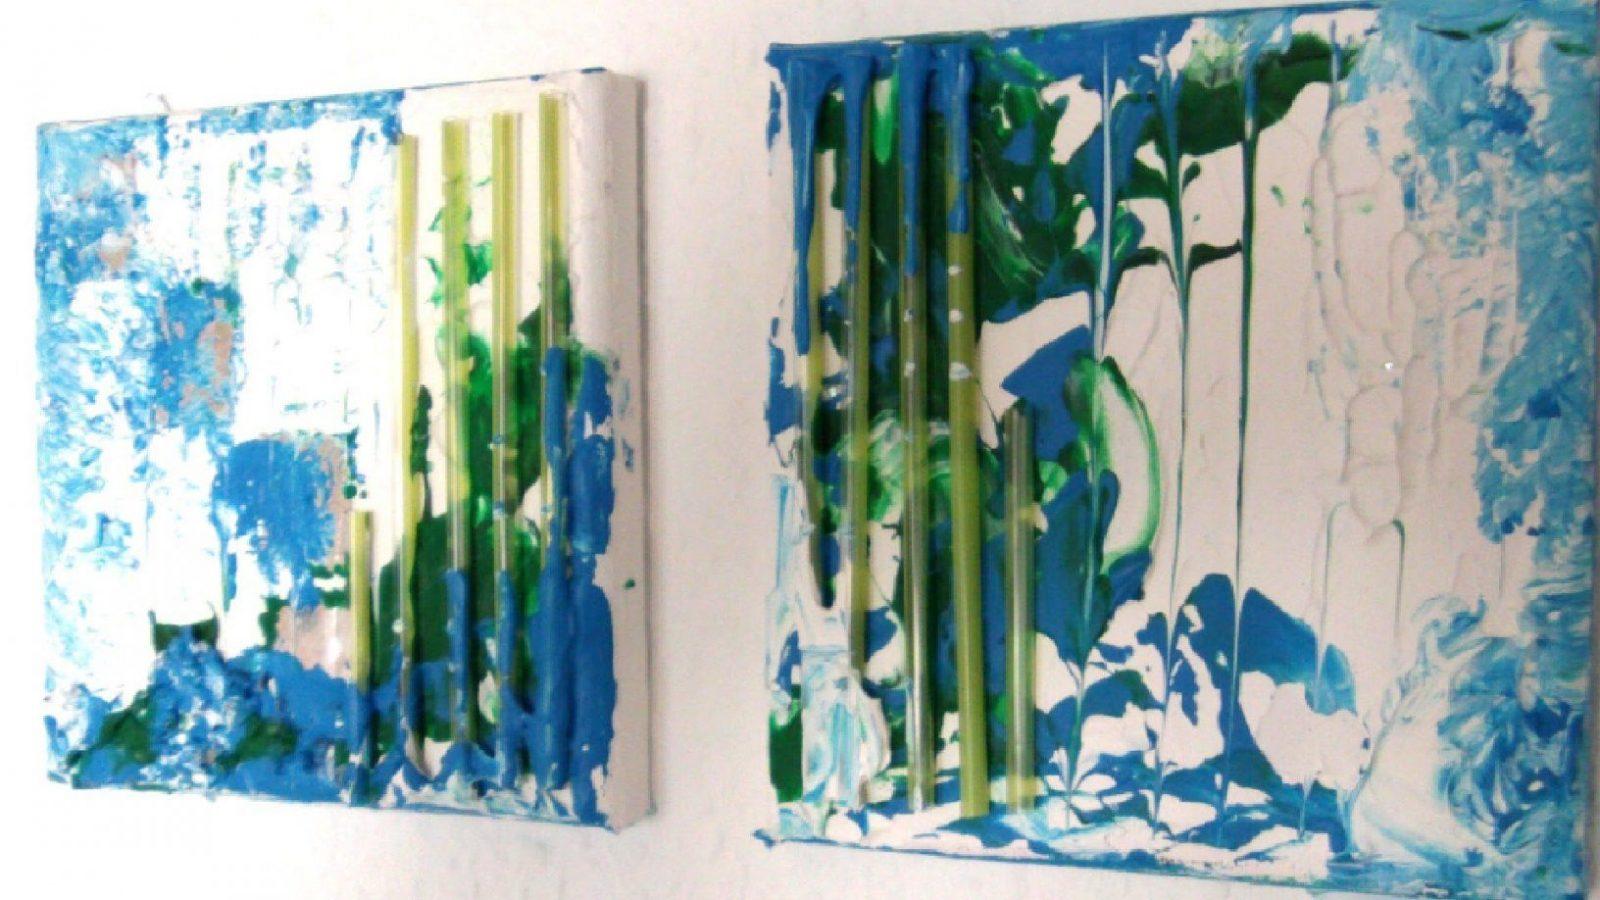 Abstrakt Malen Mit Acryl (Abstract Painting With Acrylic)[Hd]  Youtube von Acrylbilder Abstrakt Selber Malen Bild